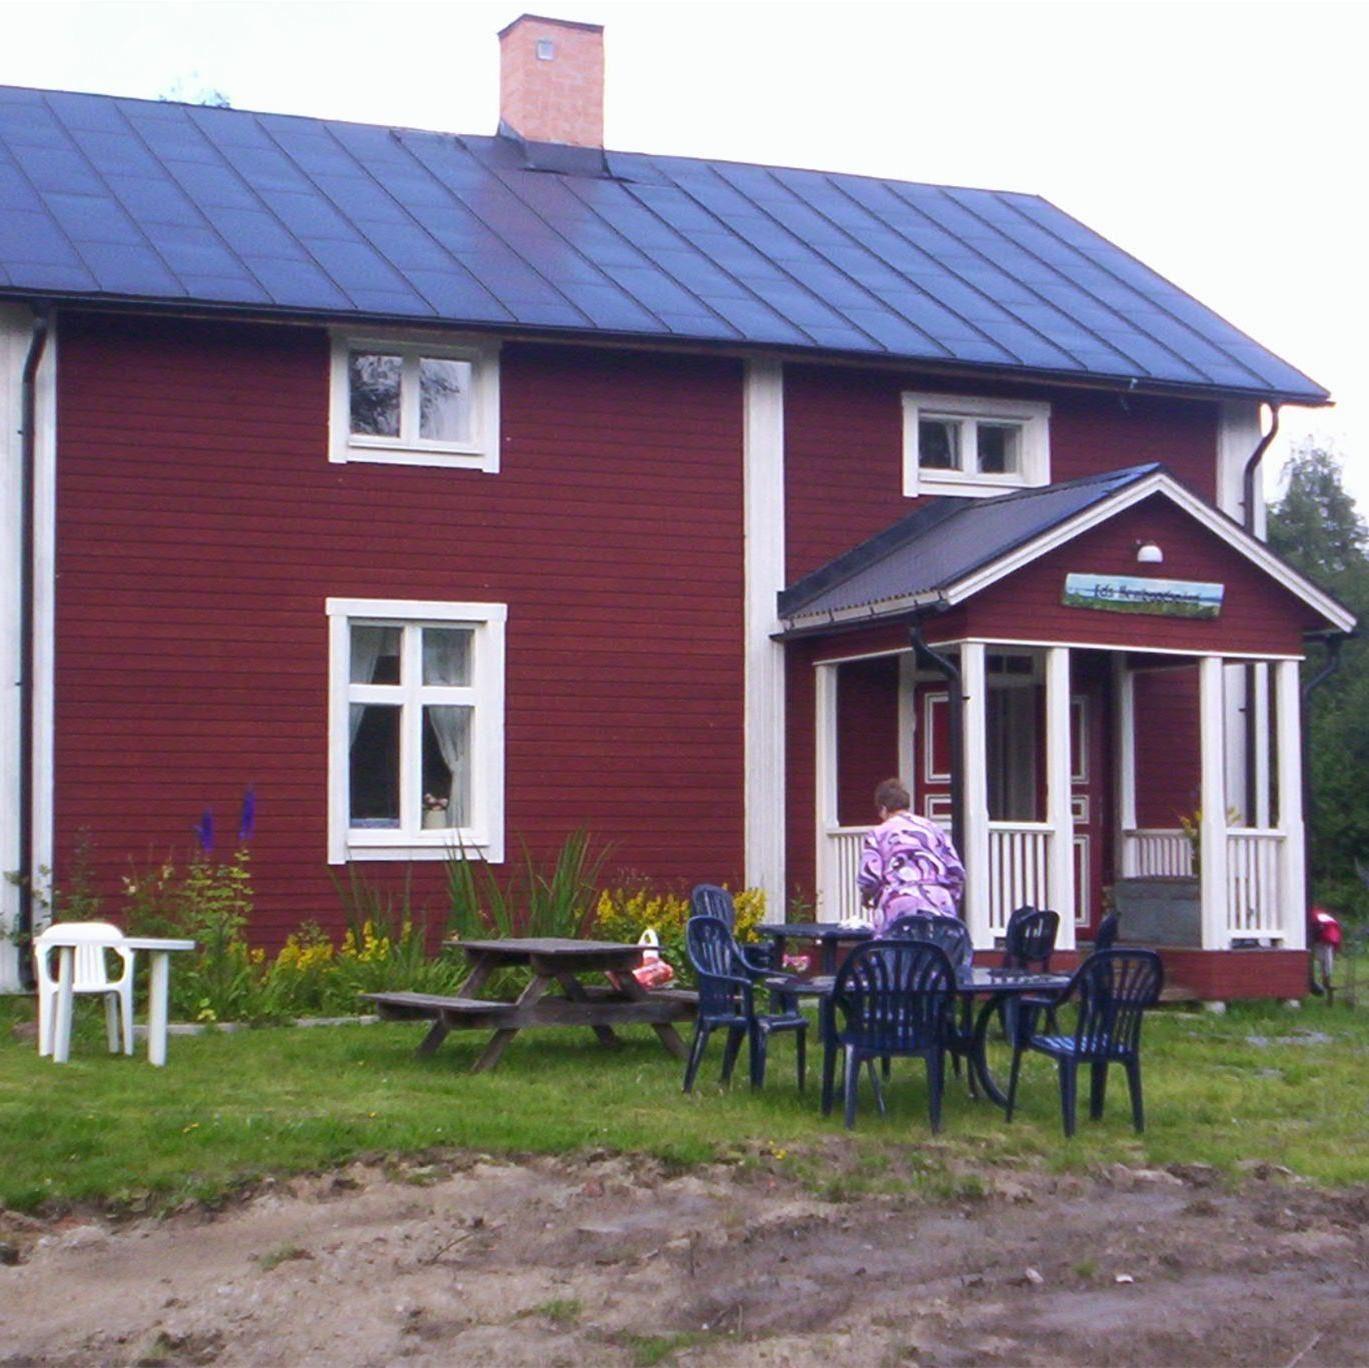 Eds Hembygdsgård